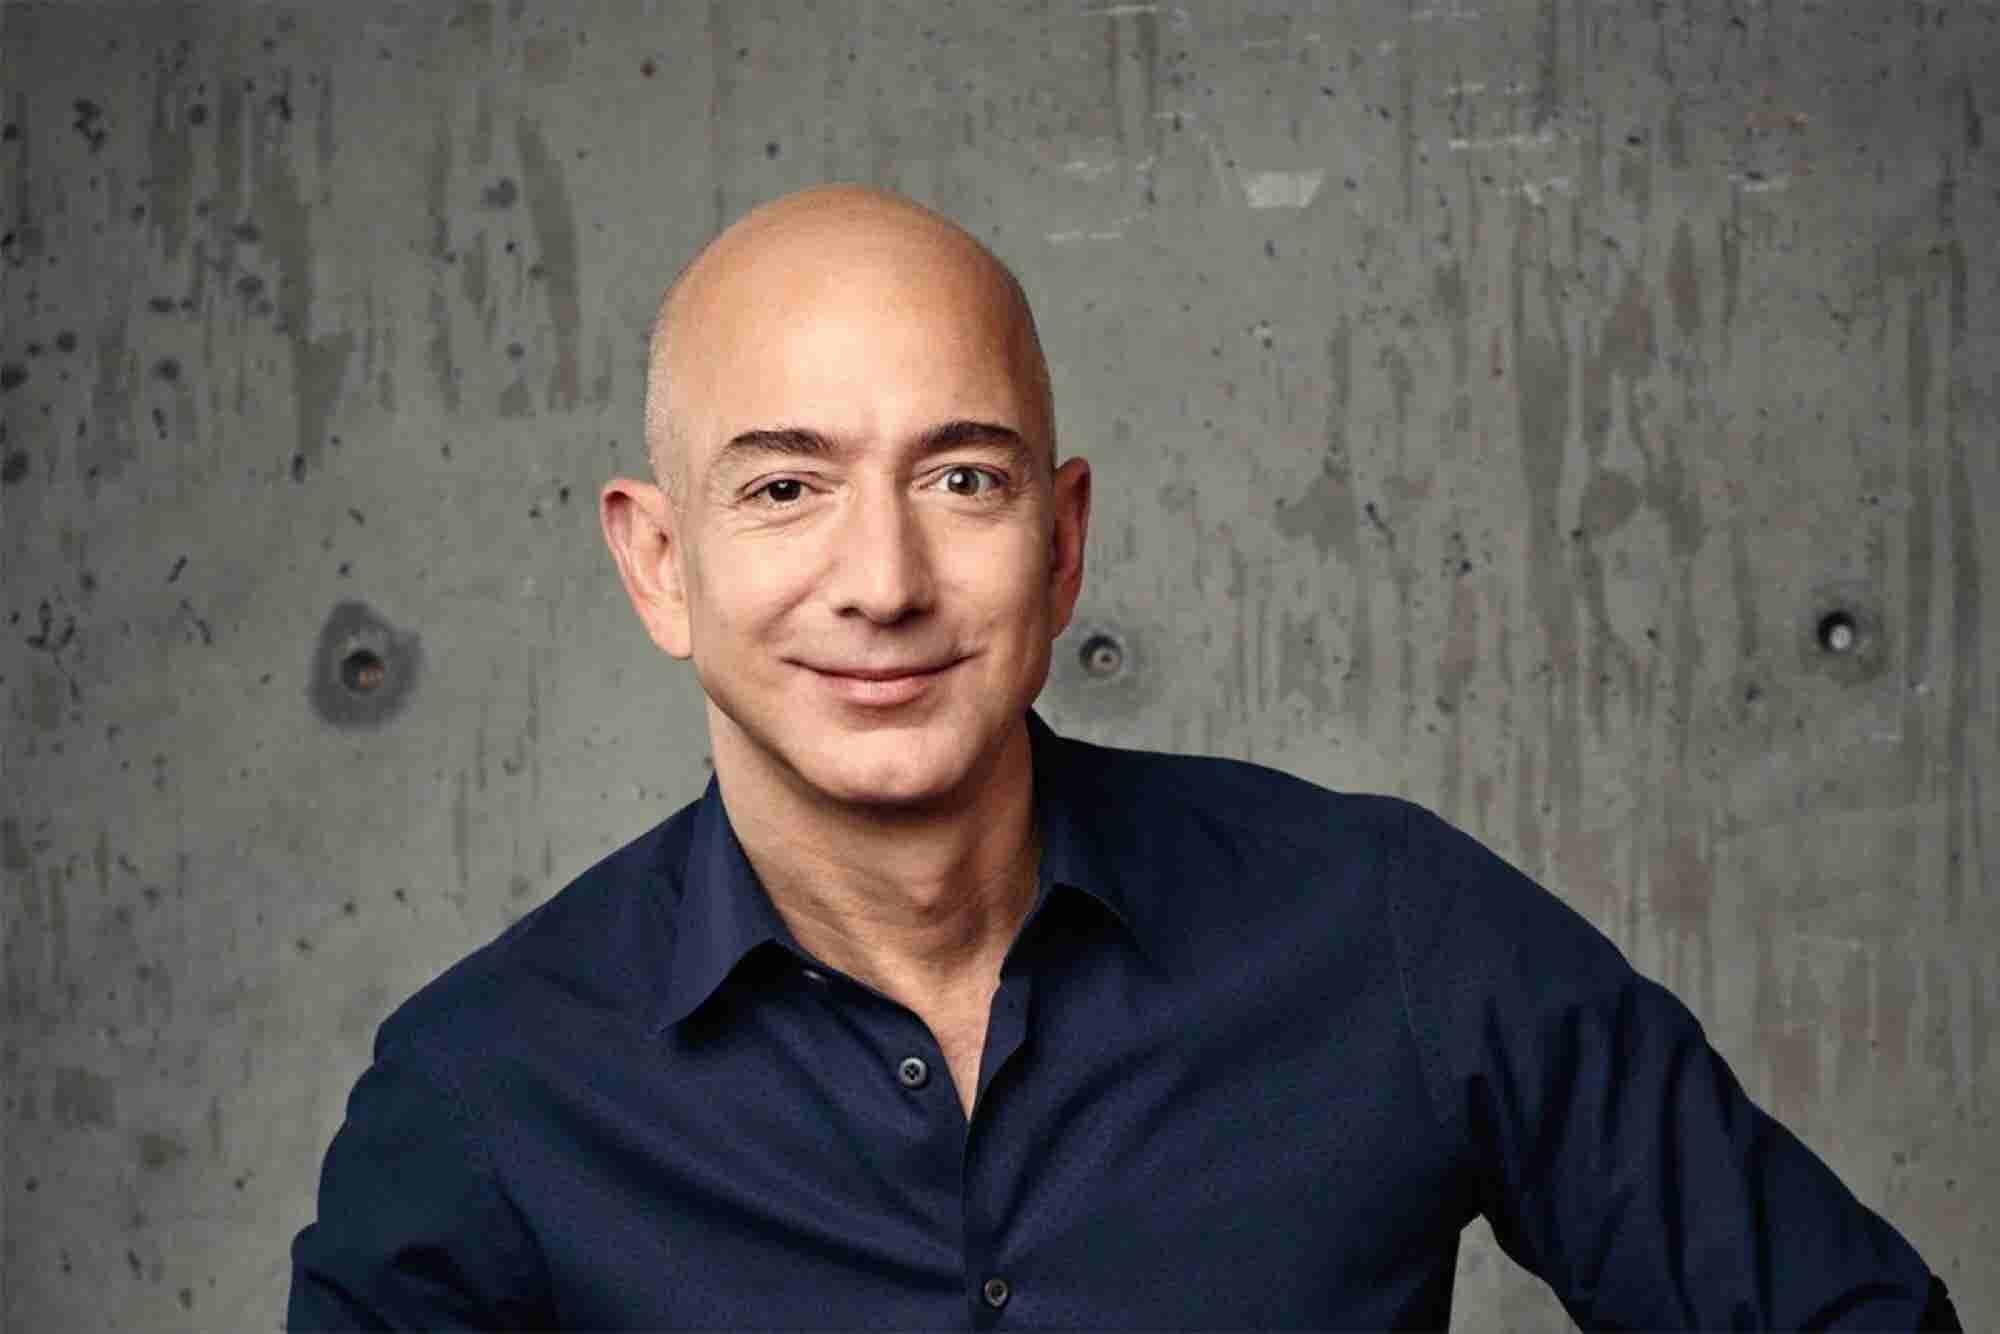 News Flash: Jeff Bezos Is Rich